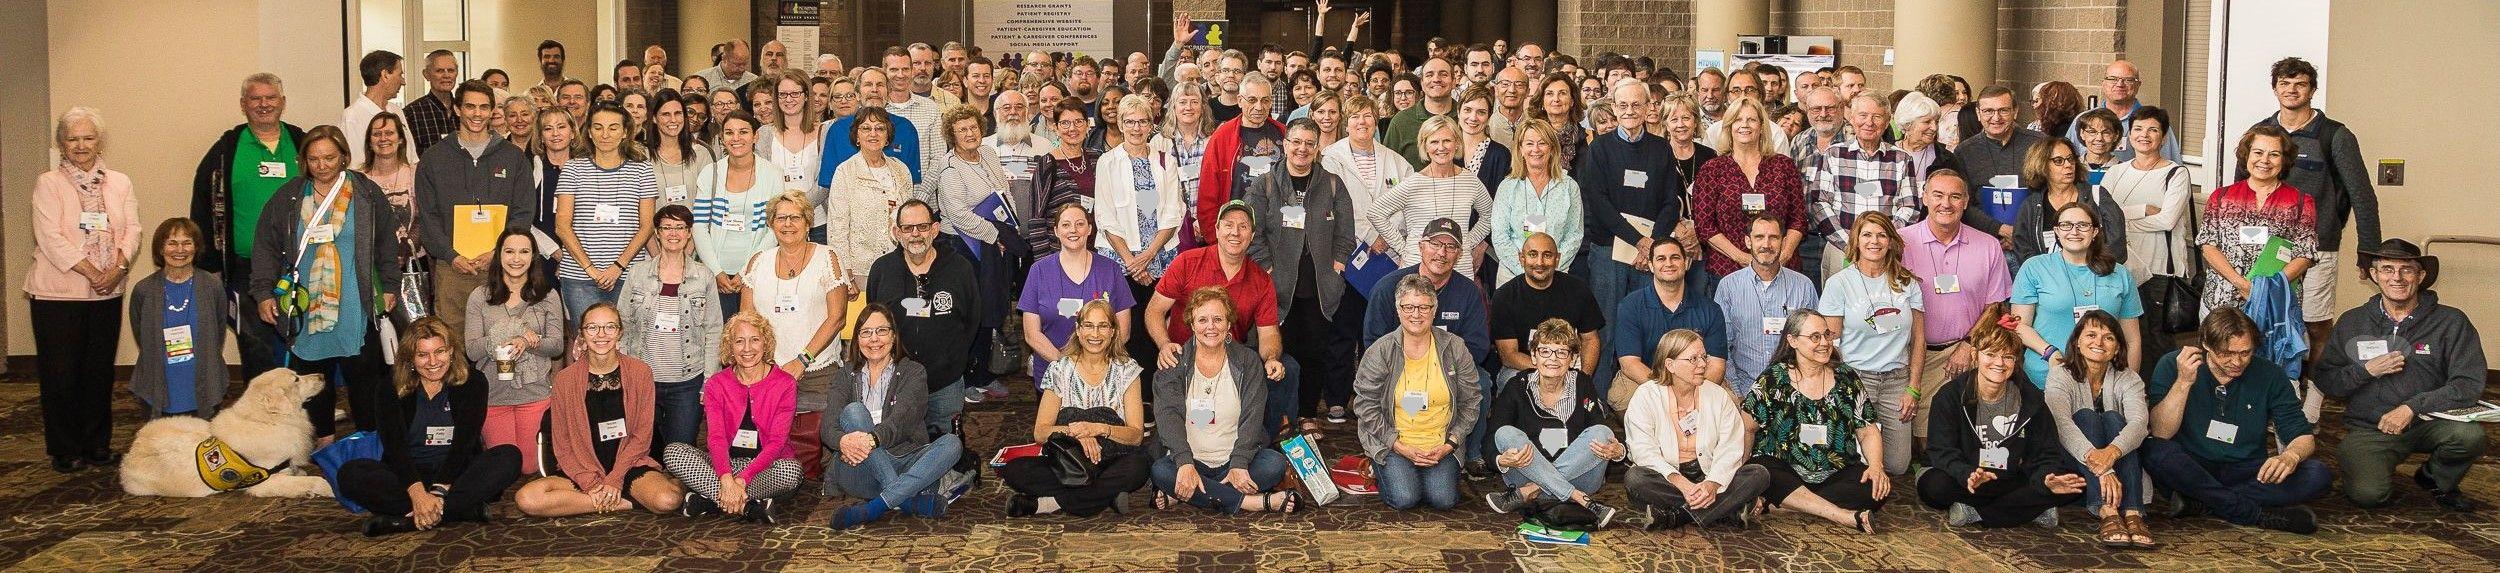 Making Our Voices Heard: PFDD Forum Oct. 23, 2020